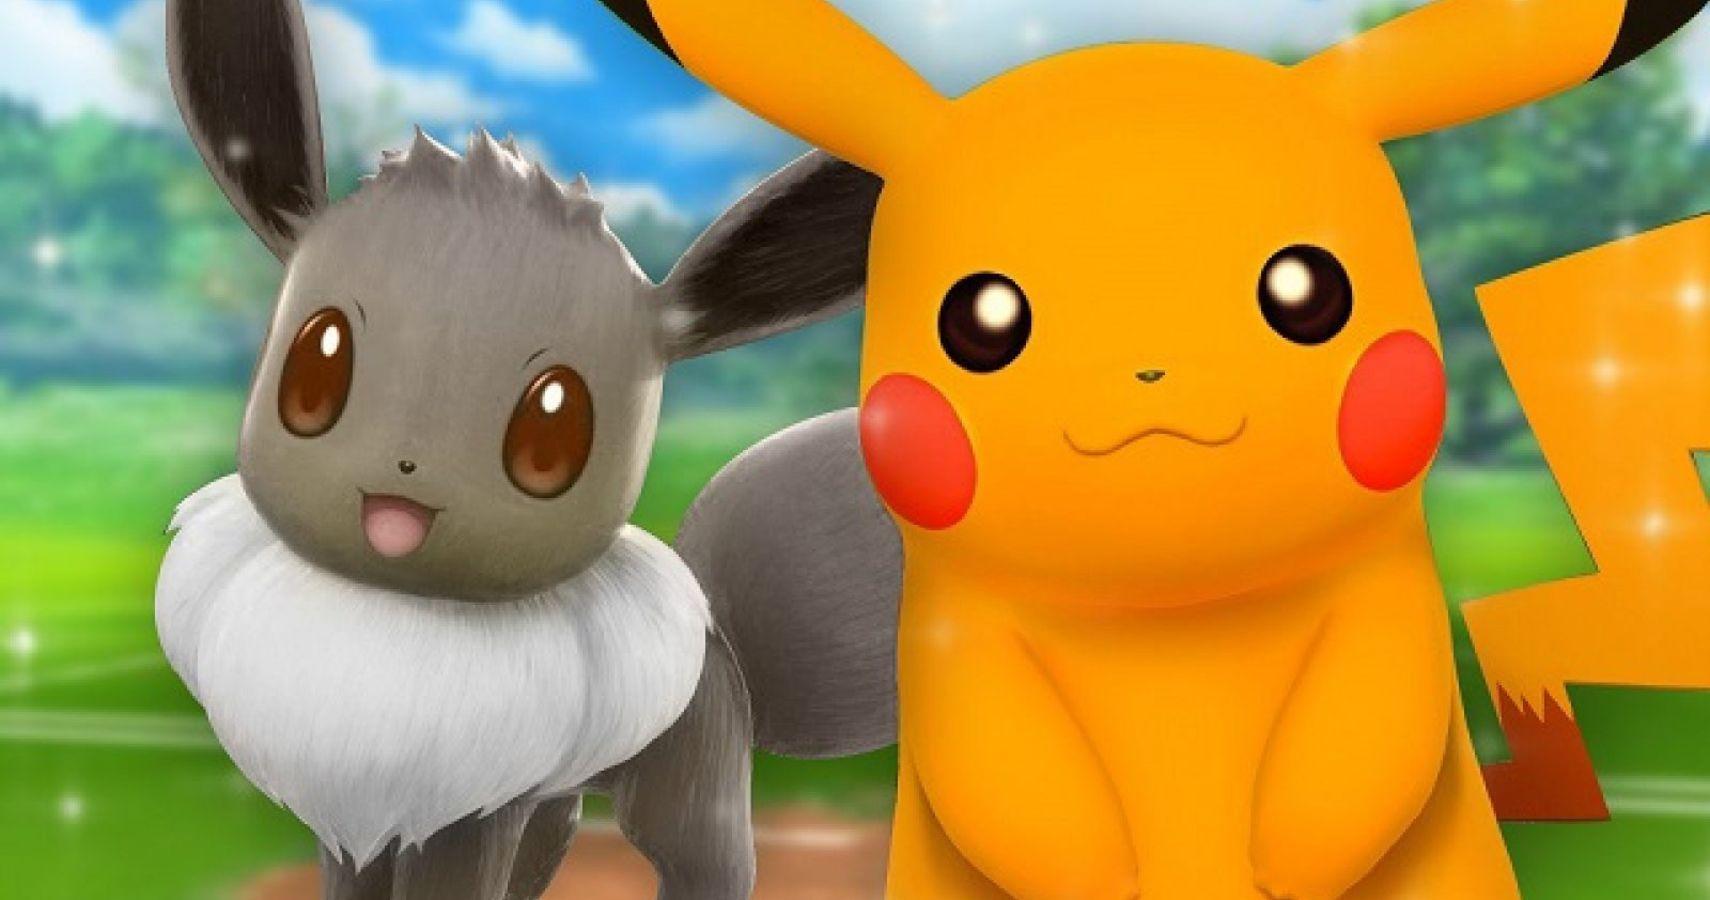 Pokemon Sword Shield Shiny Pokemon Are Not Special Grookey gangers rise up : pokemon sword shield shiny pokemon